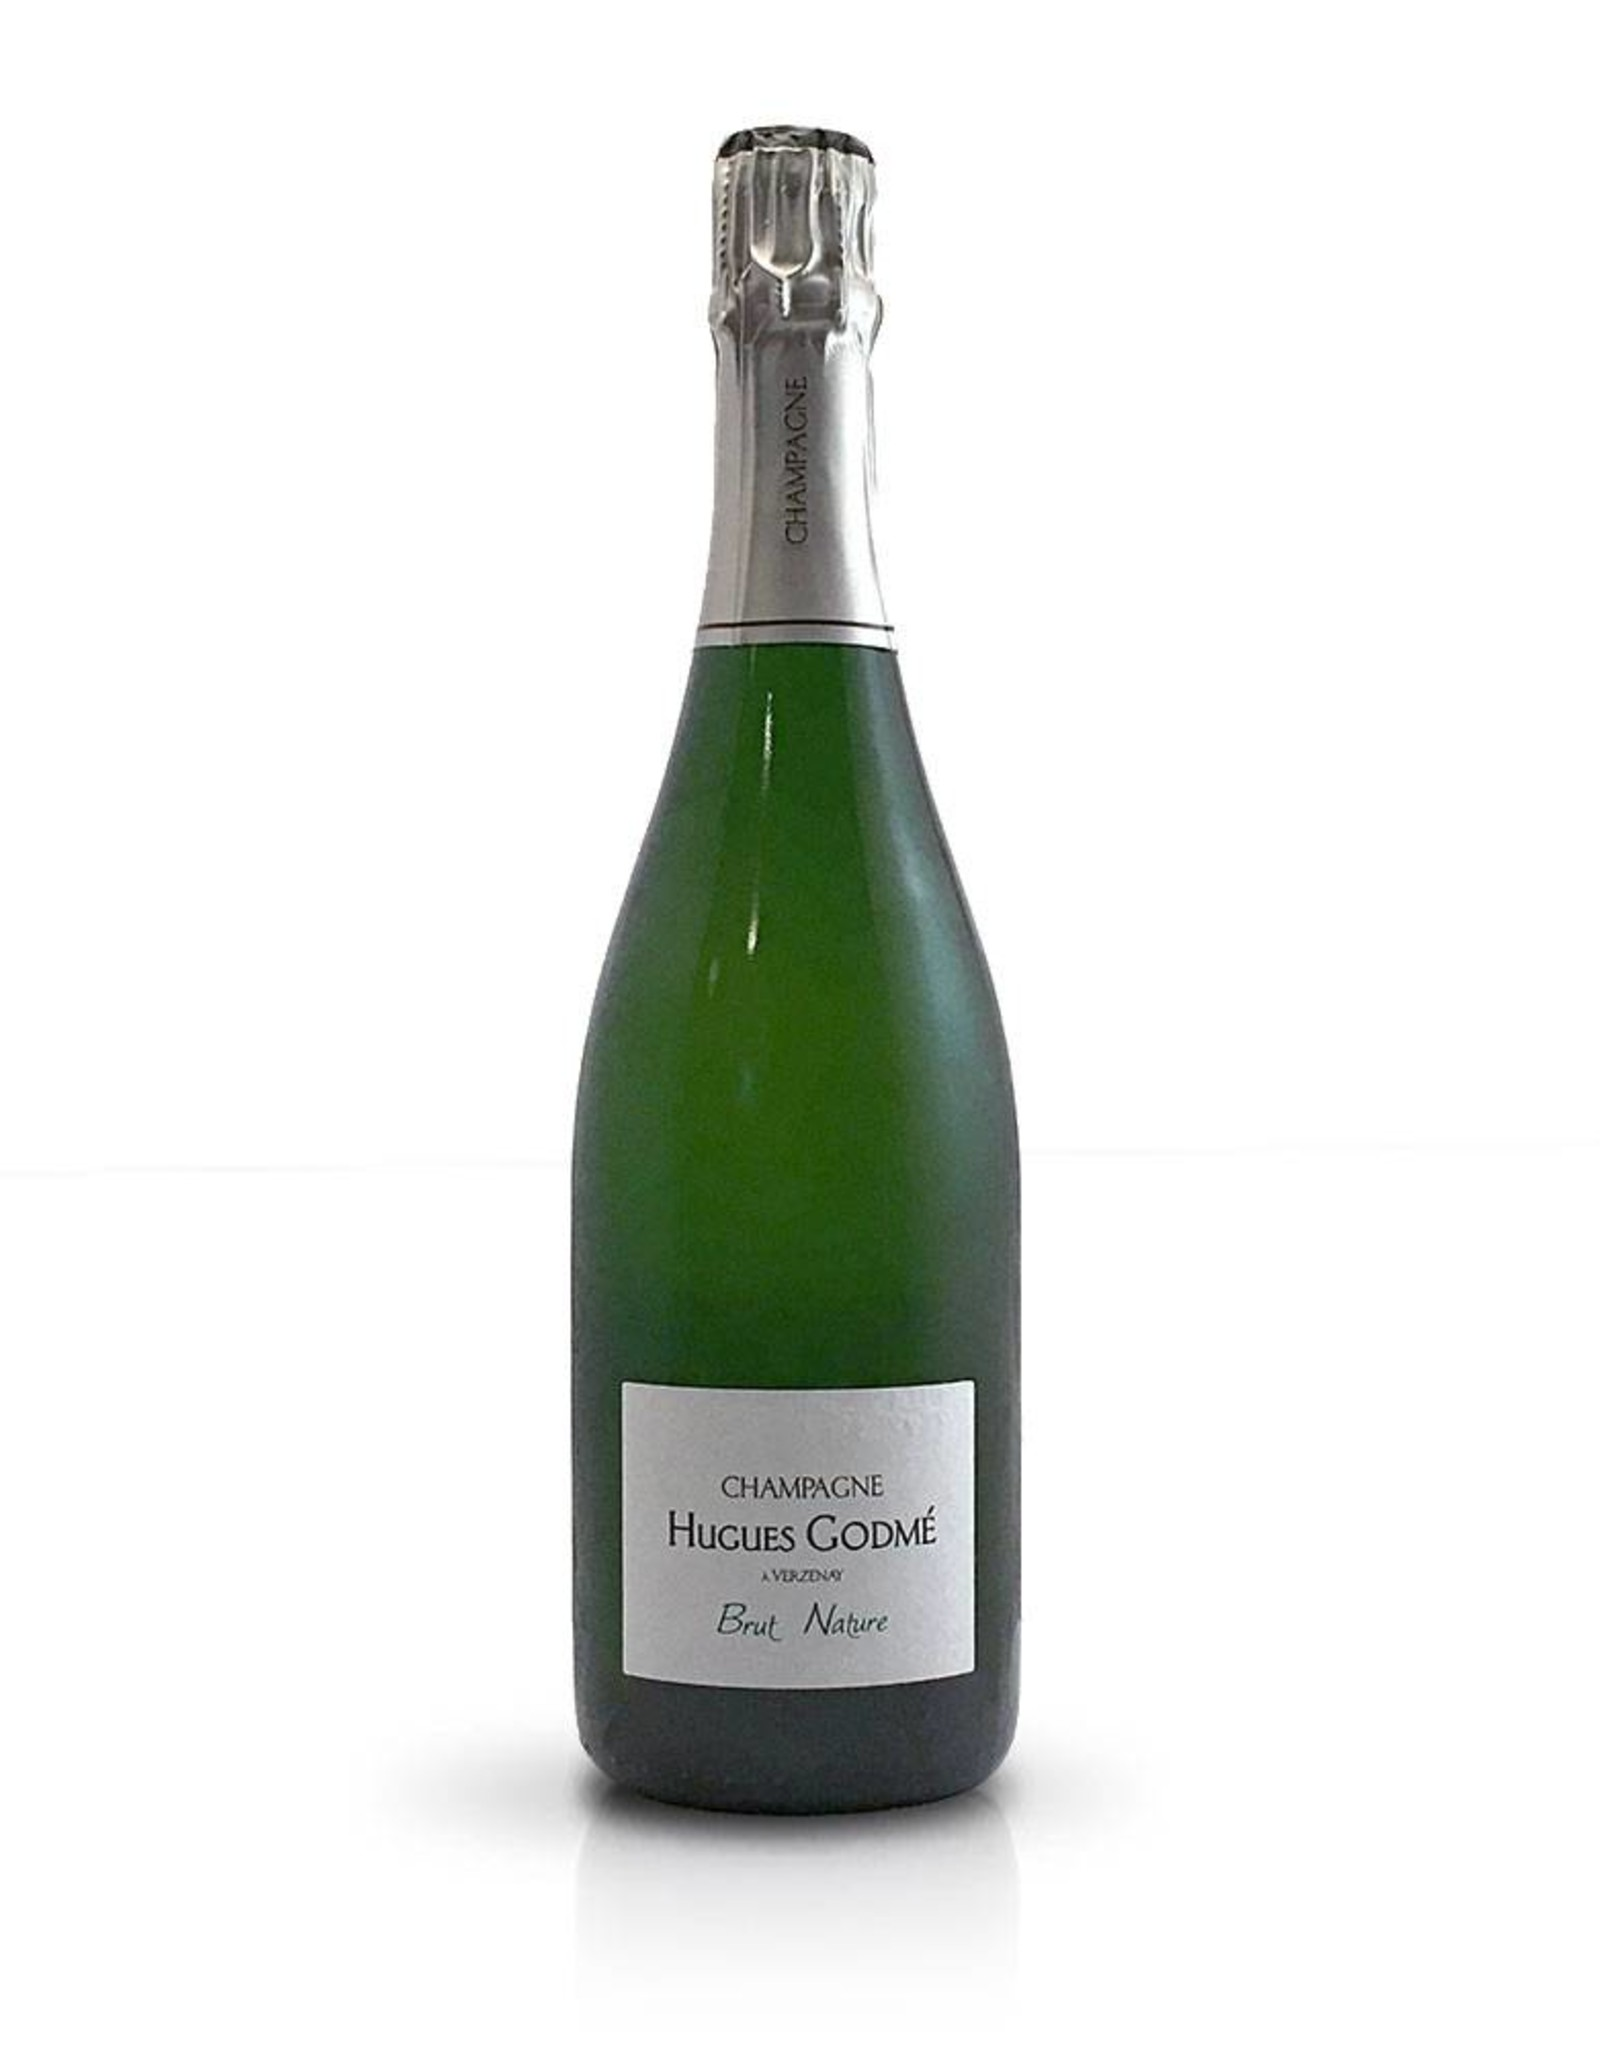 Hugues Godmé Champagne Brut Nature